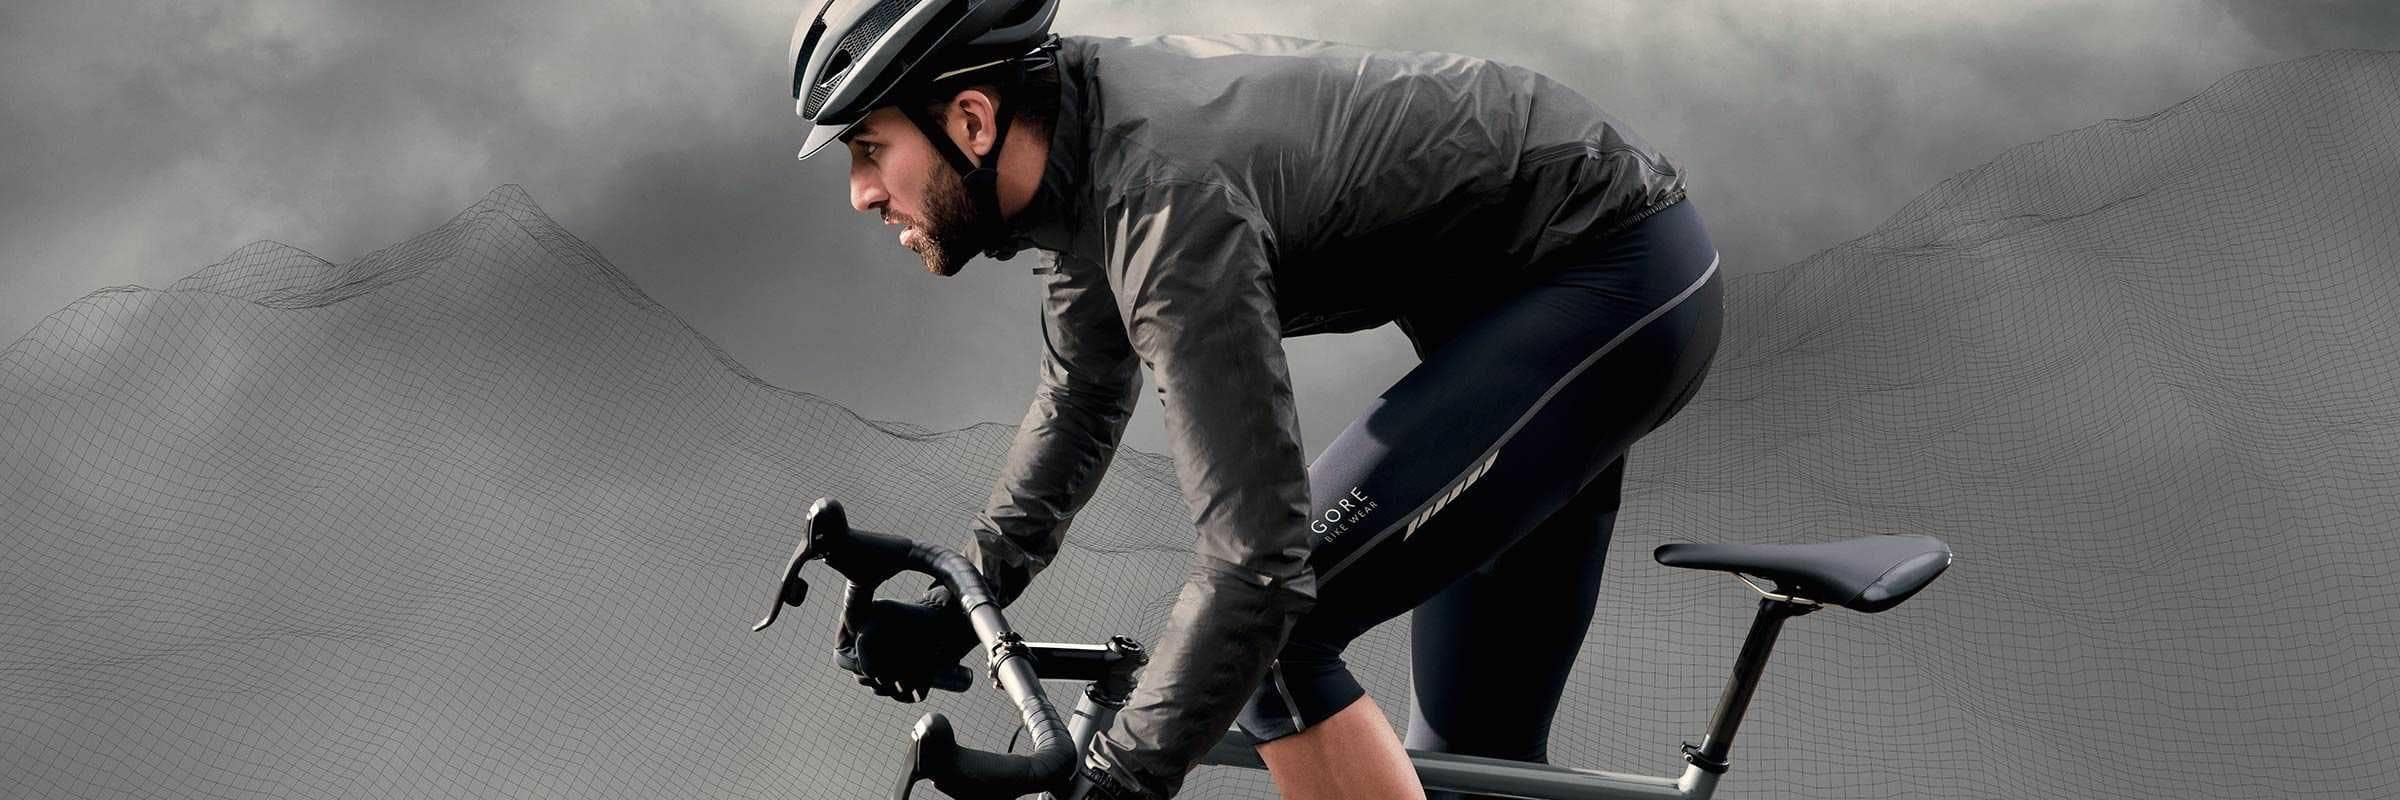 Castelli, Catlike, Garneau, Mavic, POC, Smith Optics, SUGOi. How to Choose the Right Cycling Shorts